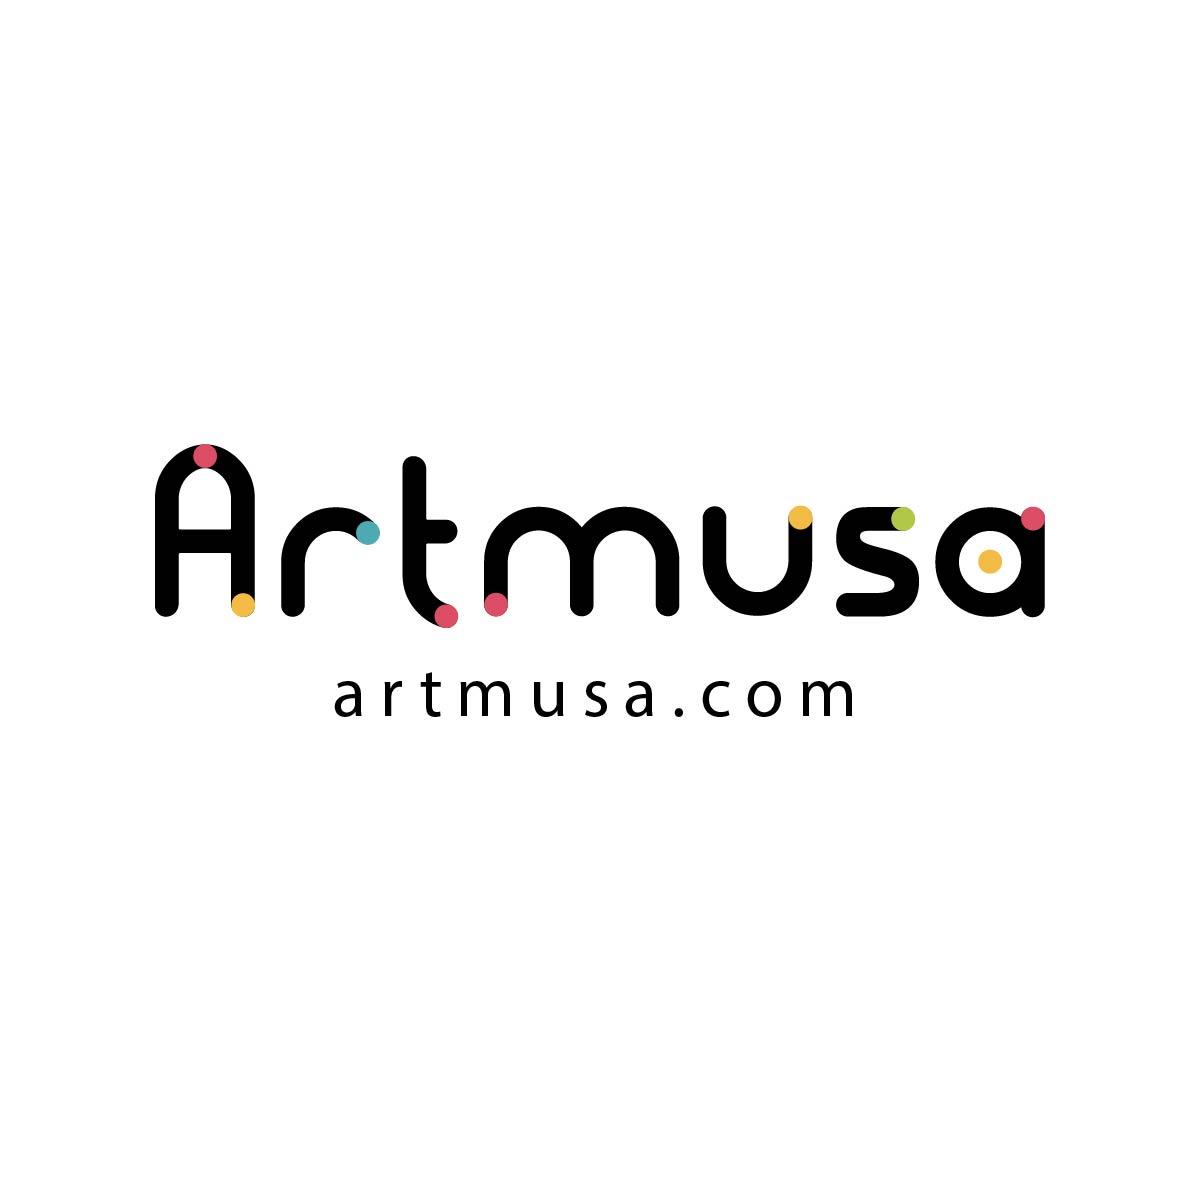 Artmusa